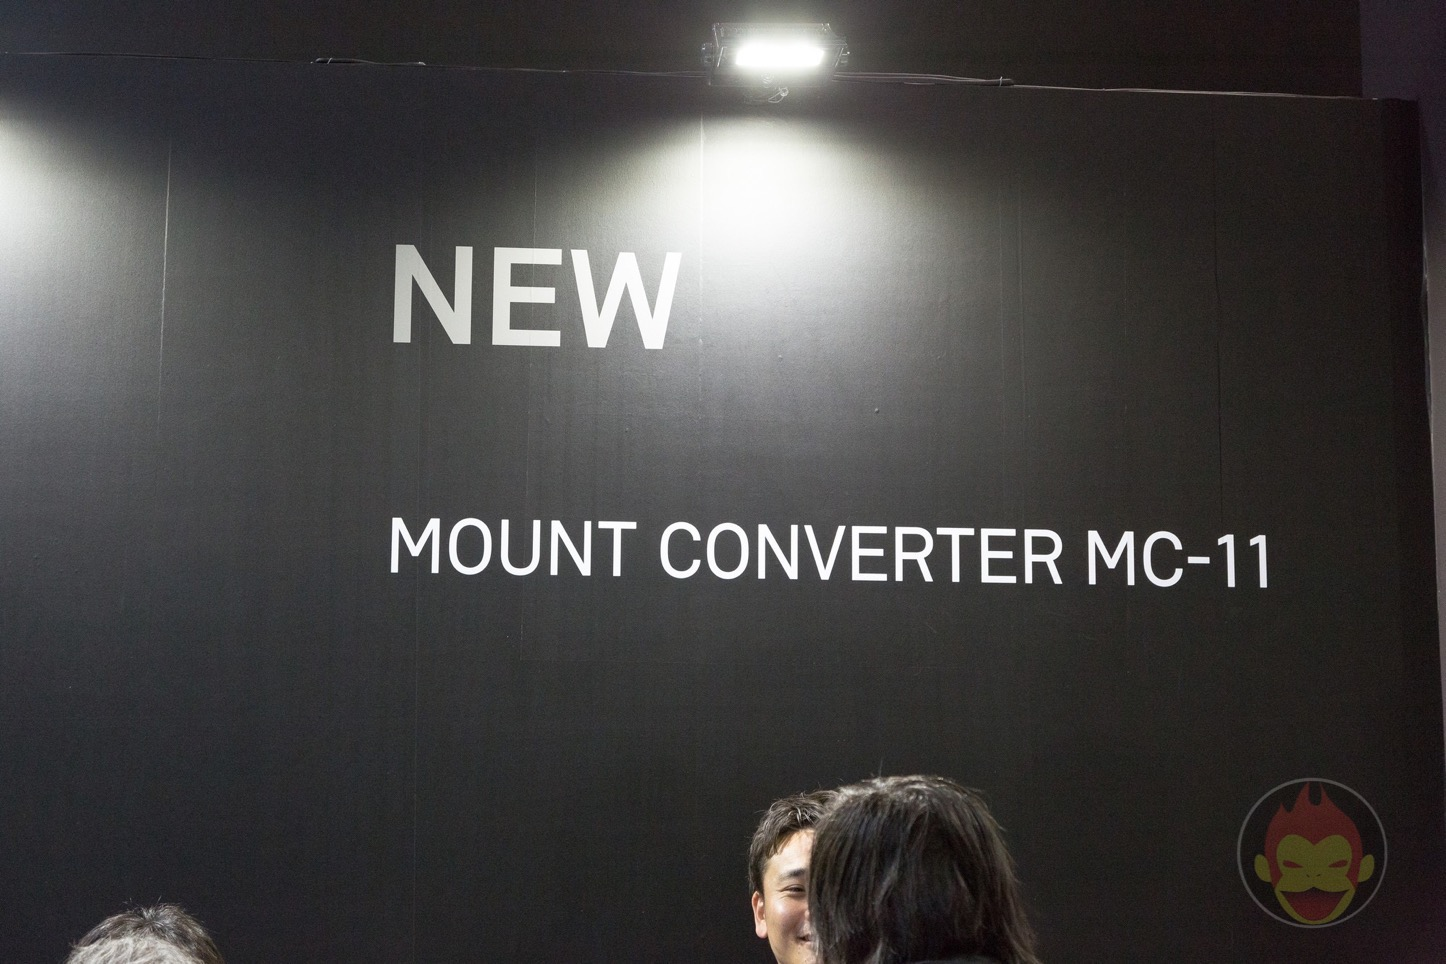 MOUNT CONVERTER MC-11